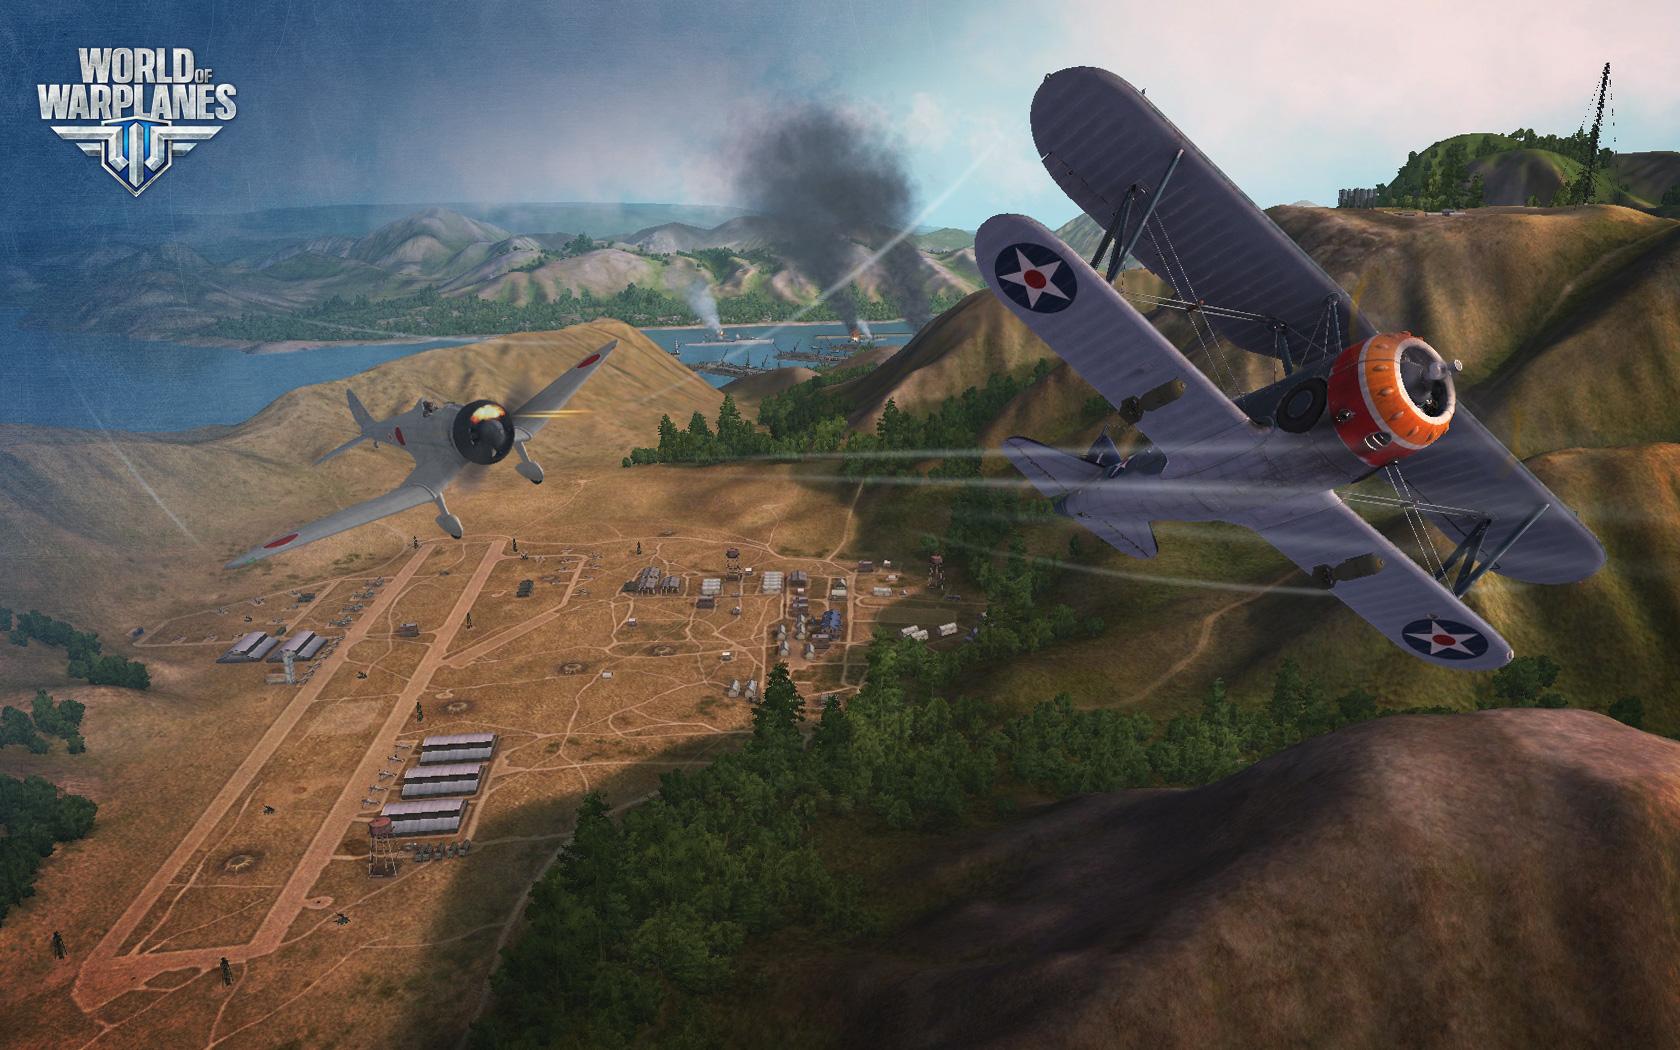 world_of_warplanes_screens_image_06.jpg